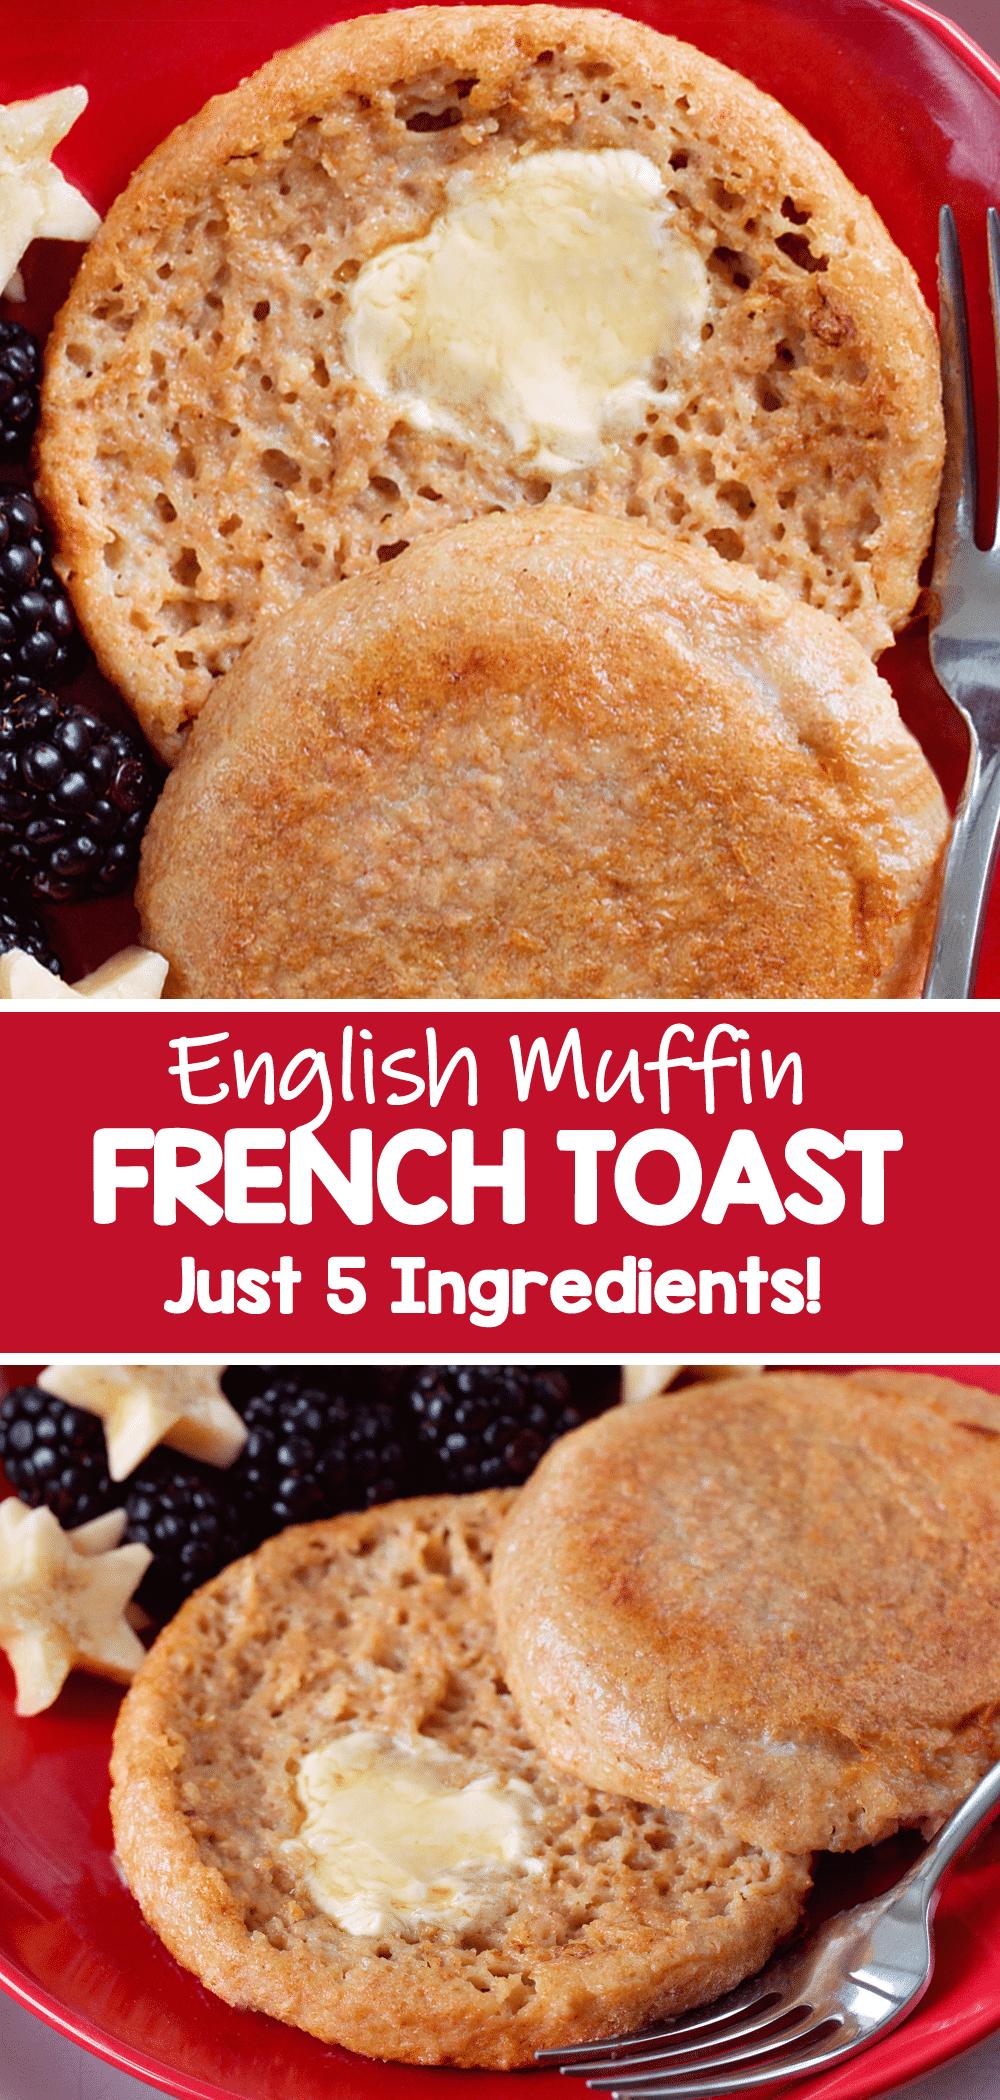 Torrada Francesa Muffin Inglês - Katie Coberta com Chocolate 2